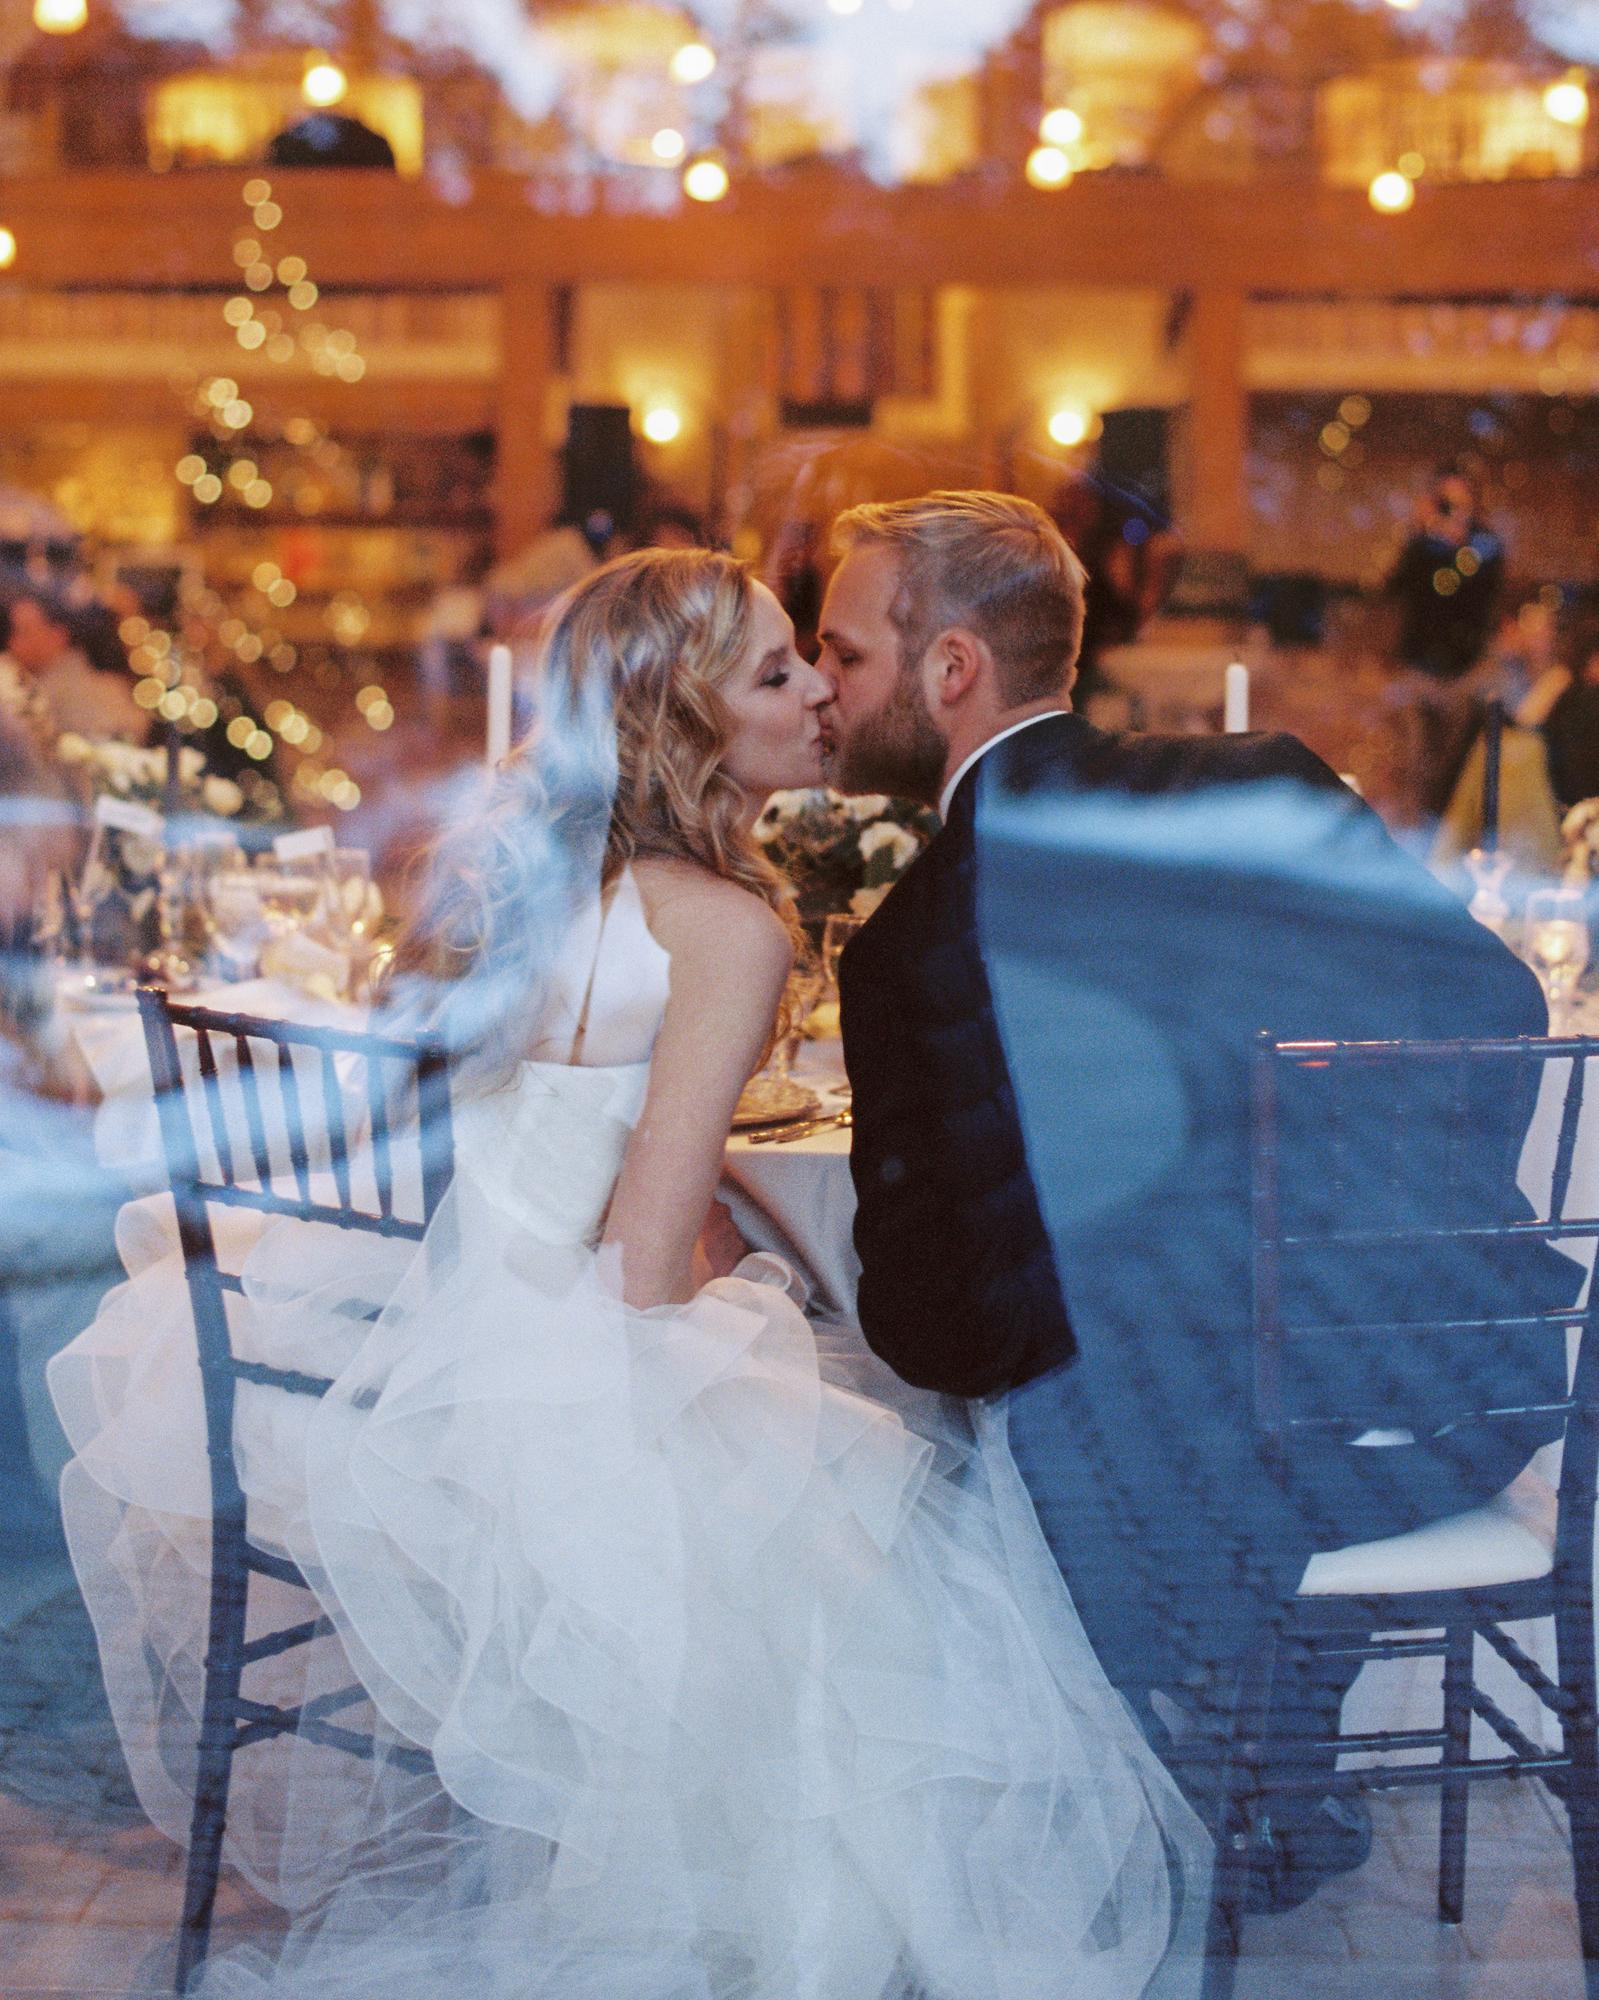 kendall-grant-wedding-kiss-116-s112328-1215.jpg